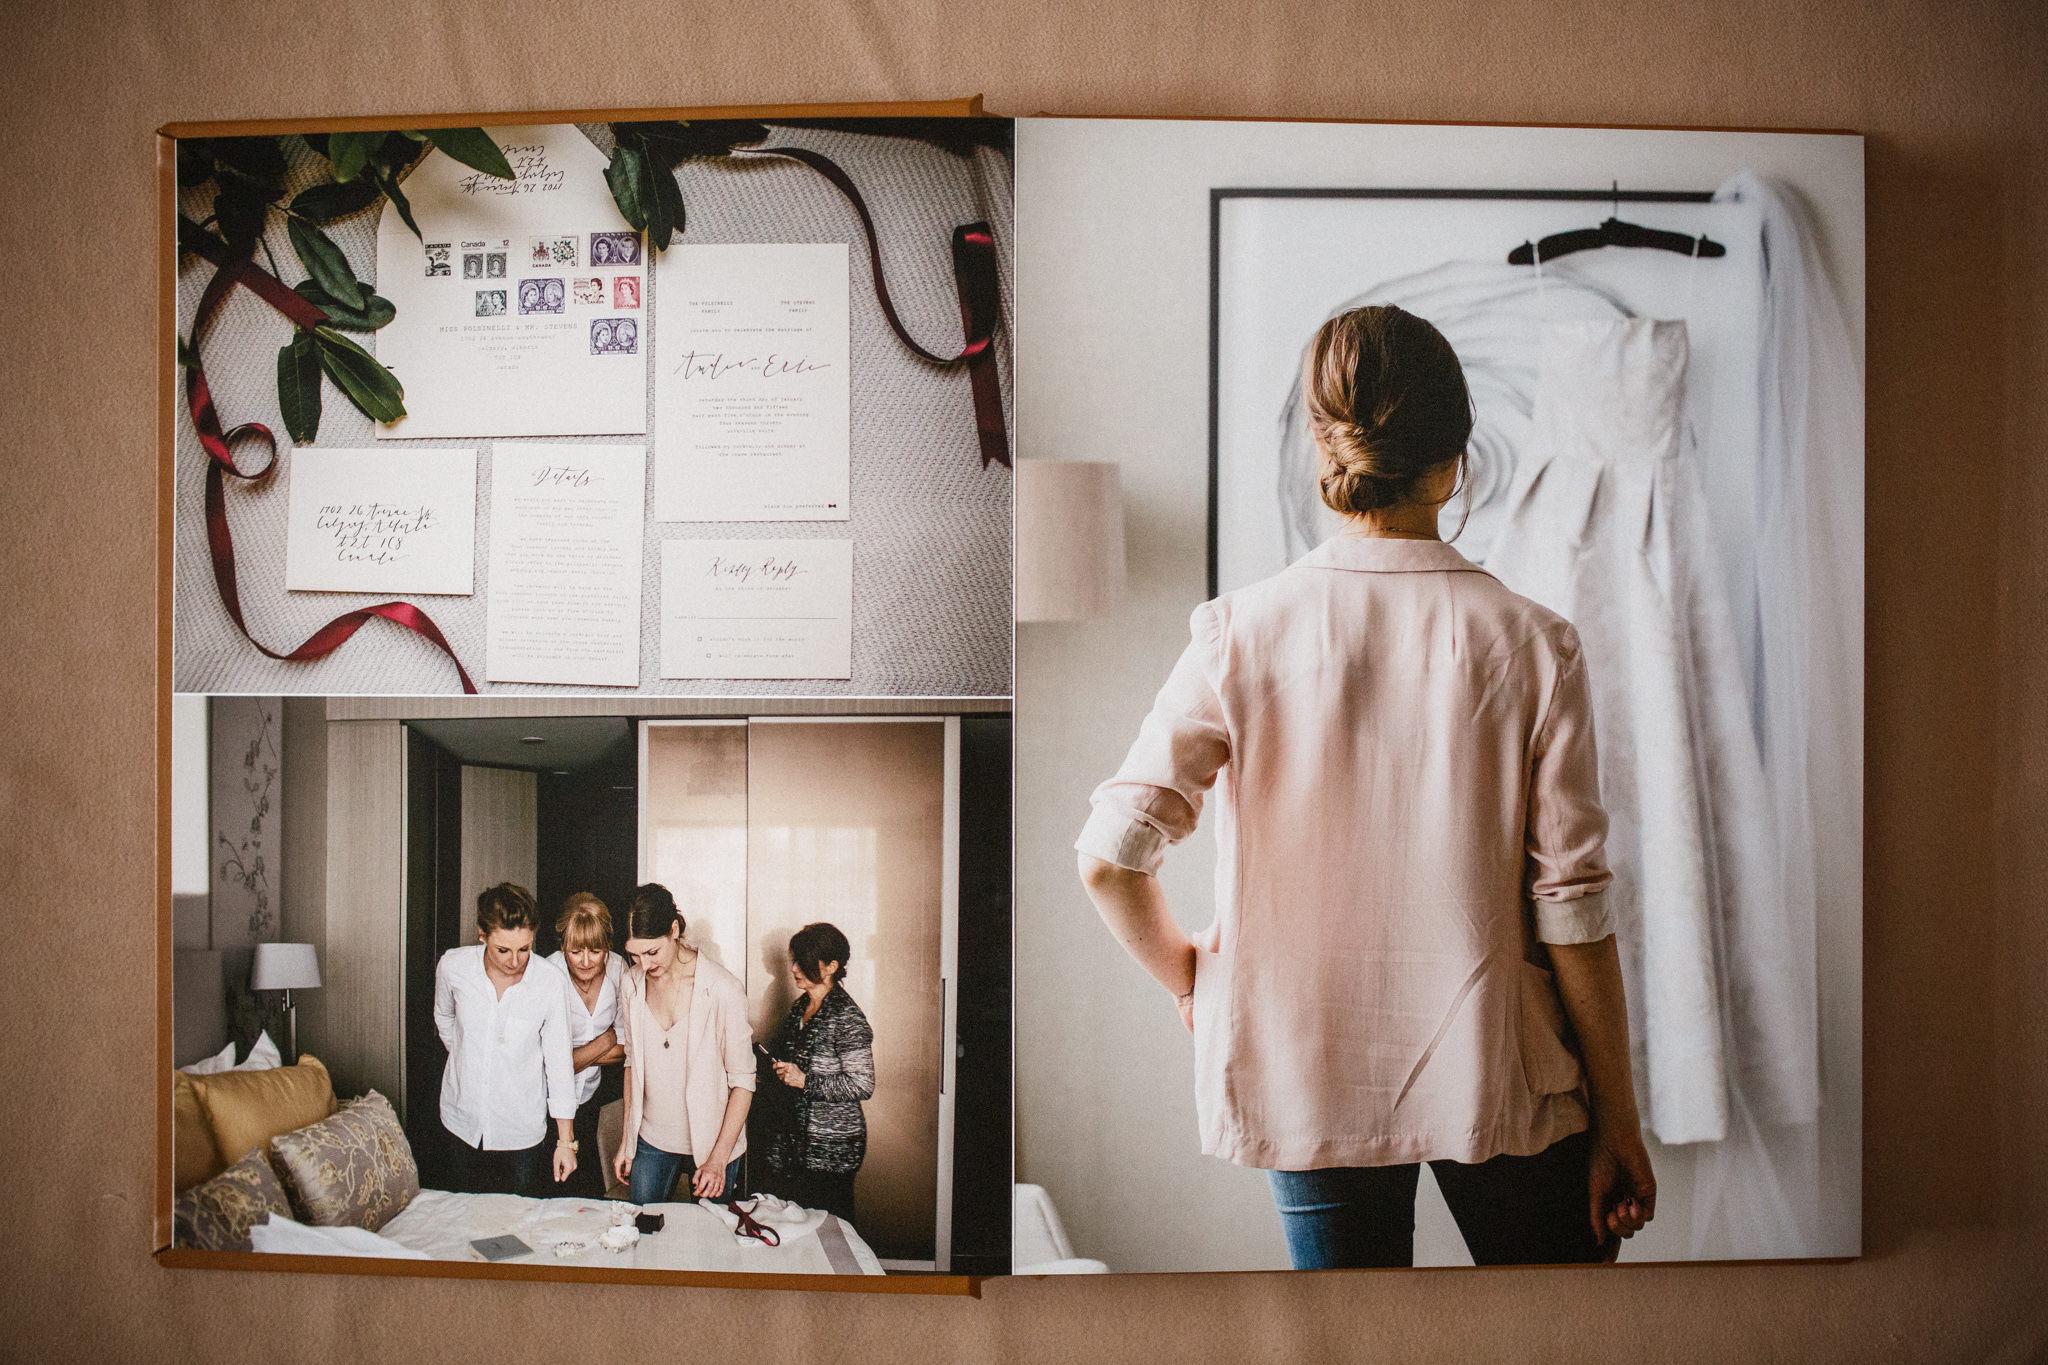 Wedding photo album of a wedding at The Four Seasons in Toronto.